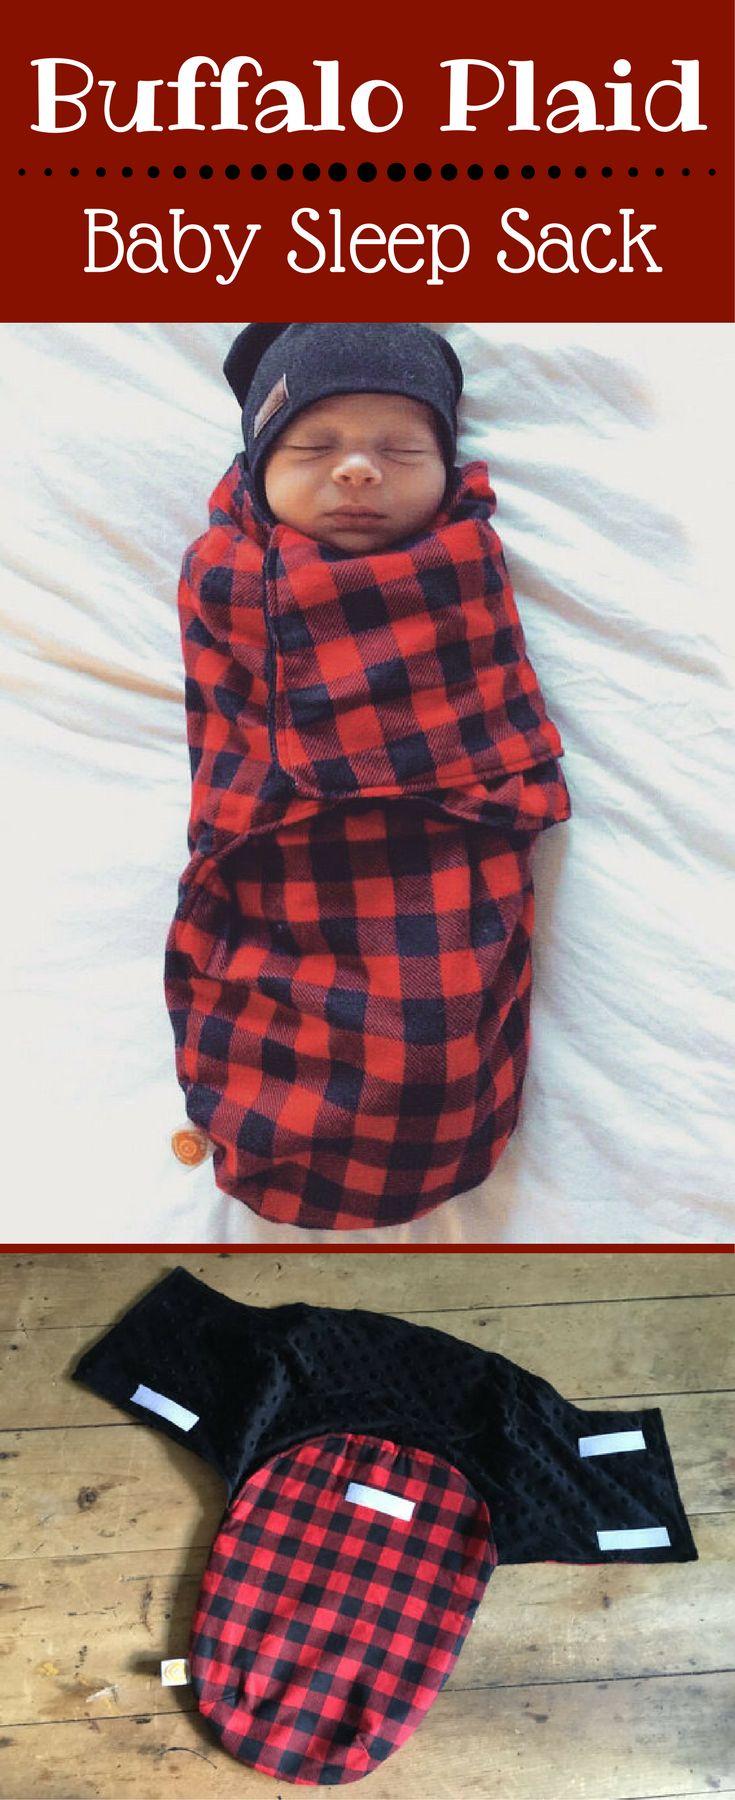 This sleep sack is so, so cute! Buffalo plaid baby sleep sack lined with minky material. Buffalo Plaid | Buffalo Check | Lumberjack Plaid | Baby Swaddle | Baby Shower Gift Ideas #buffalocheck #ad #buffaloplaideverything #babyswaddle